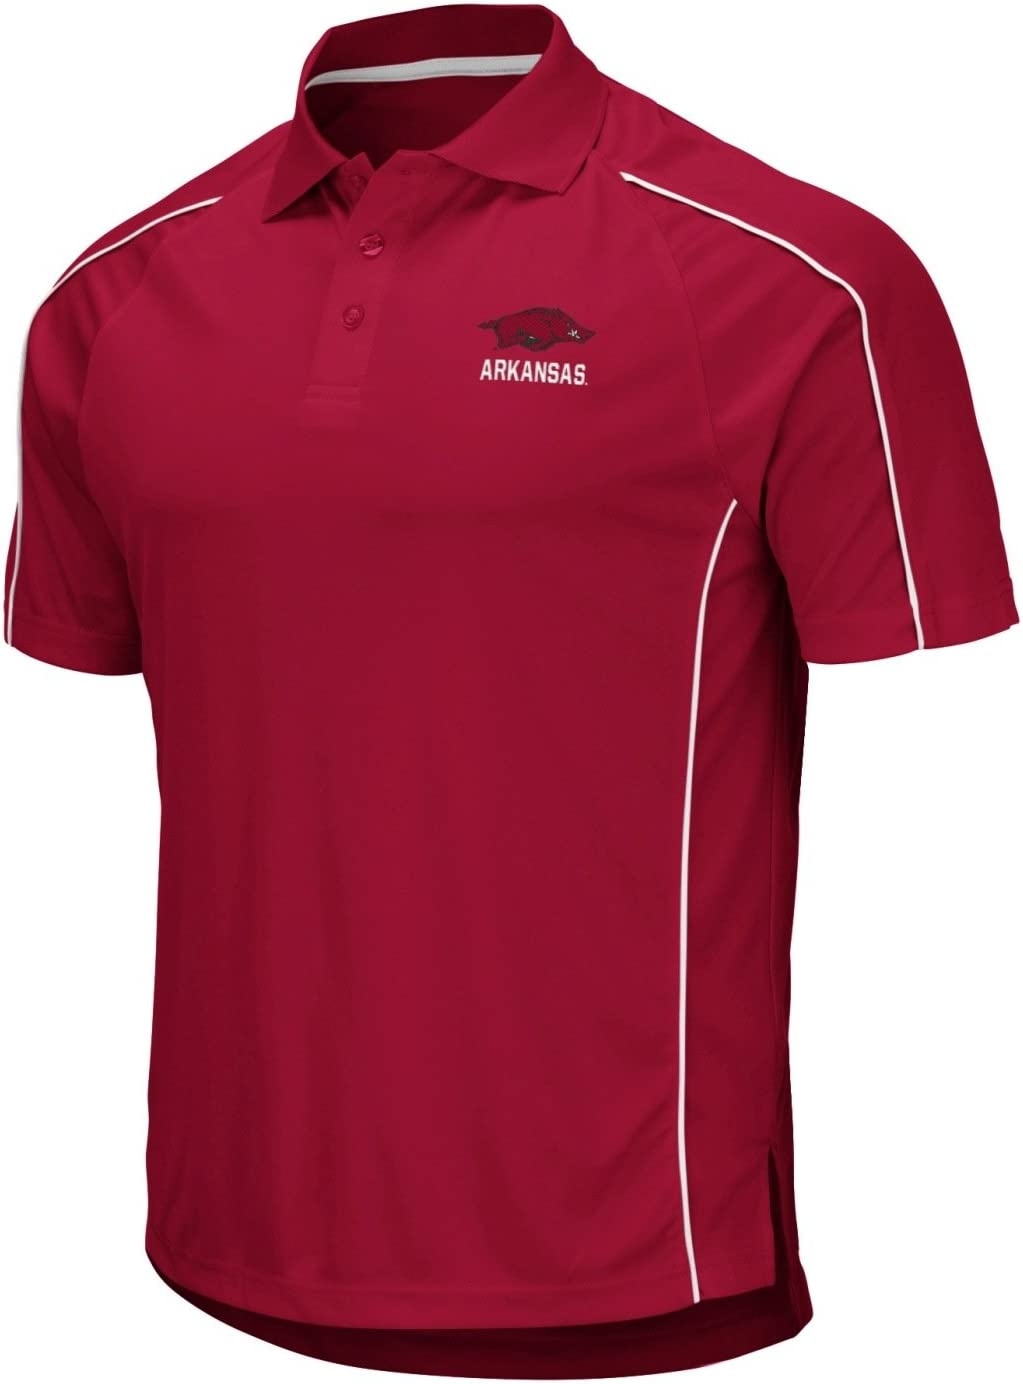 Stadium Athletics Arkansas Razorbacks NCAA Bunker Mens Performance Polo Shirt